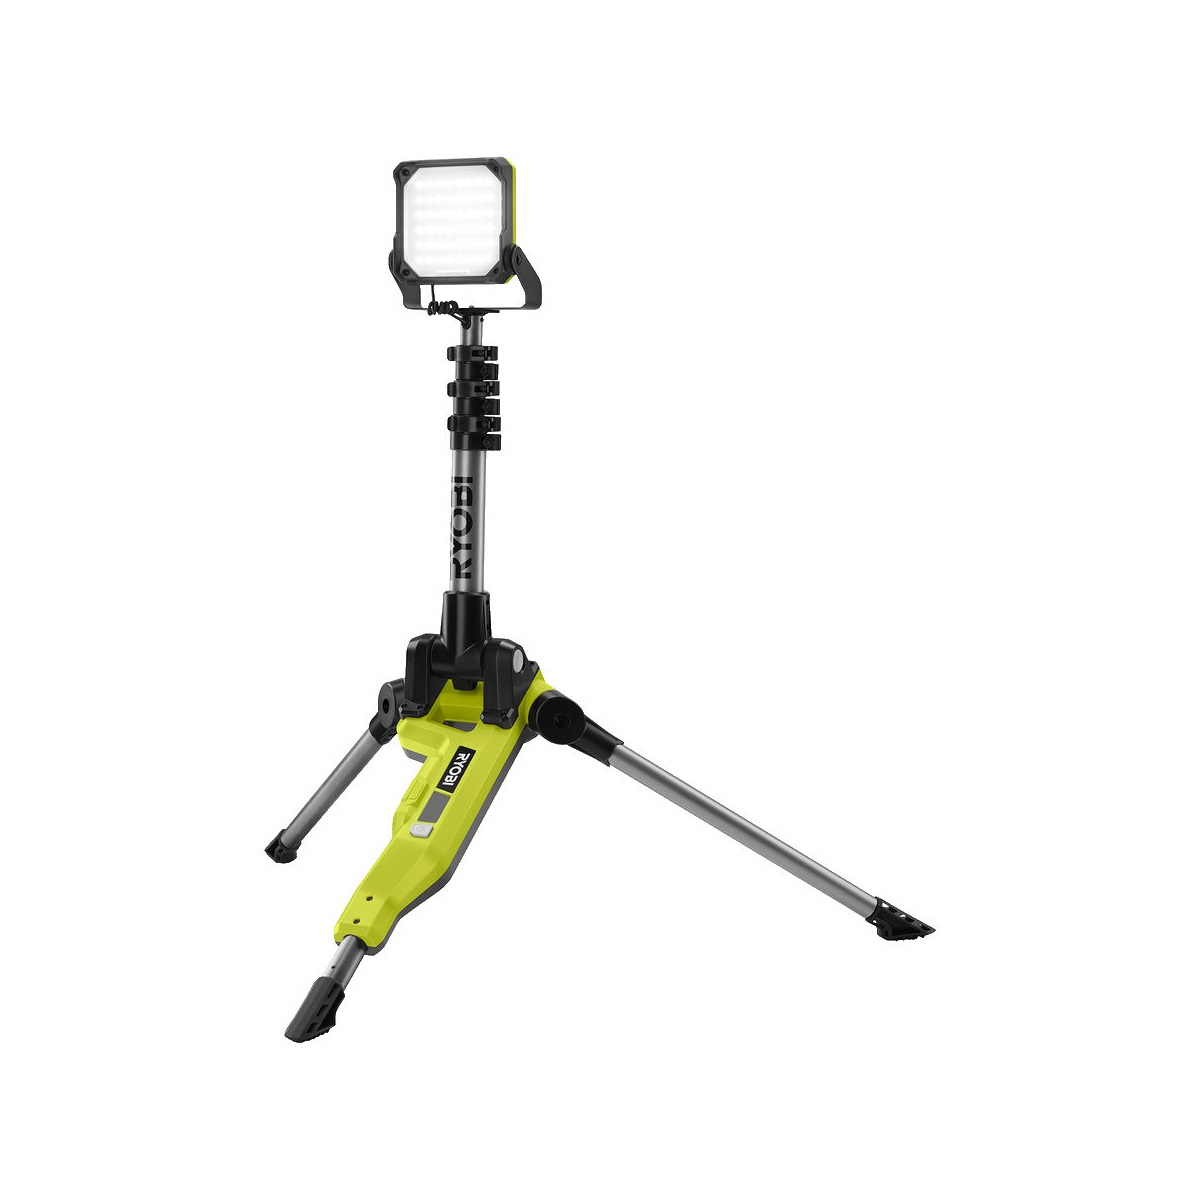 Ryobi R18TL-0, aku 18 V pracovní reflektor se stojanem ONE+(bez baterie a nabíječky)